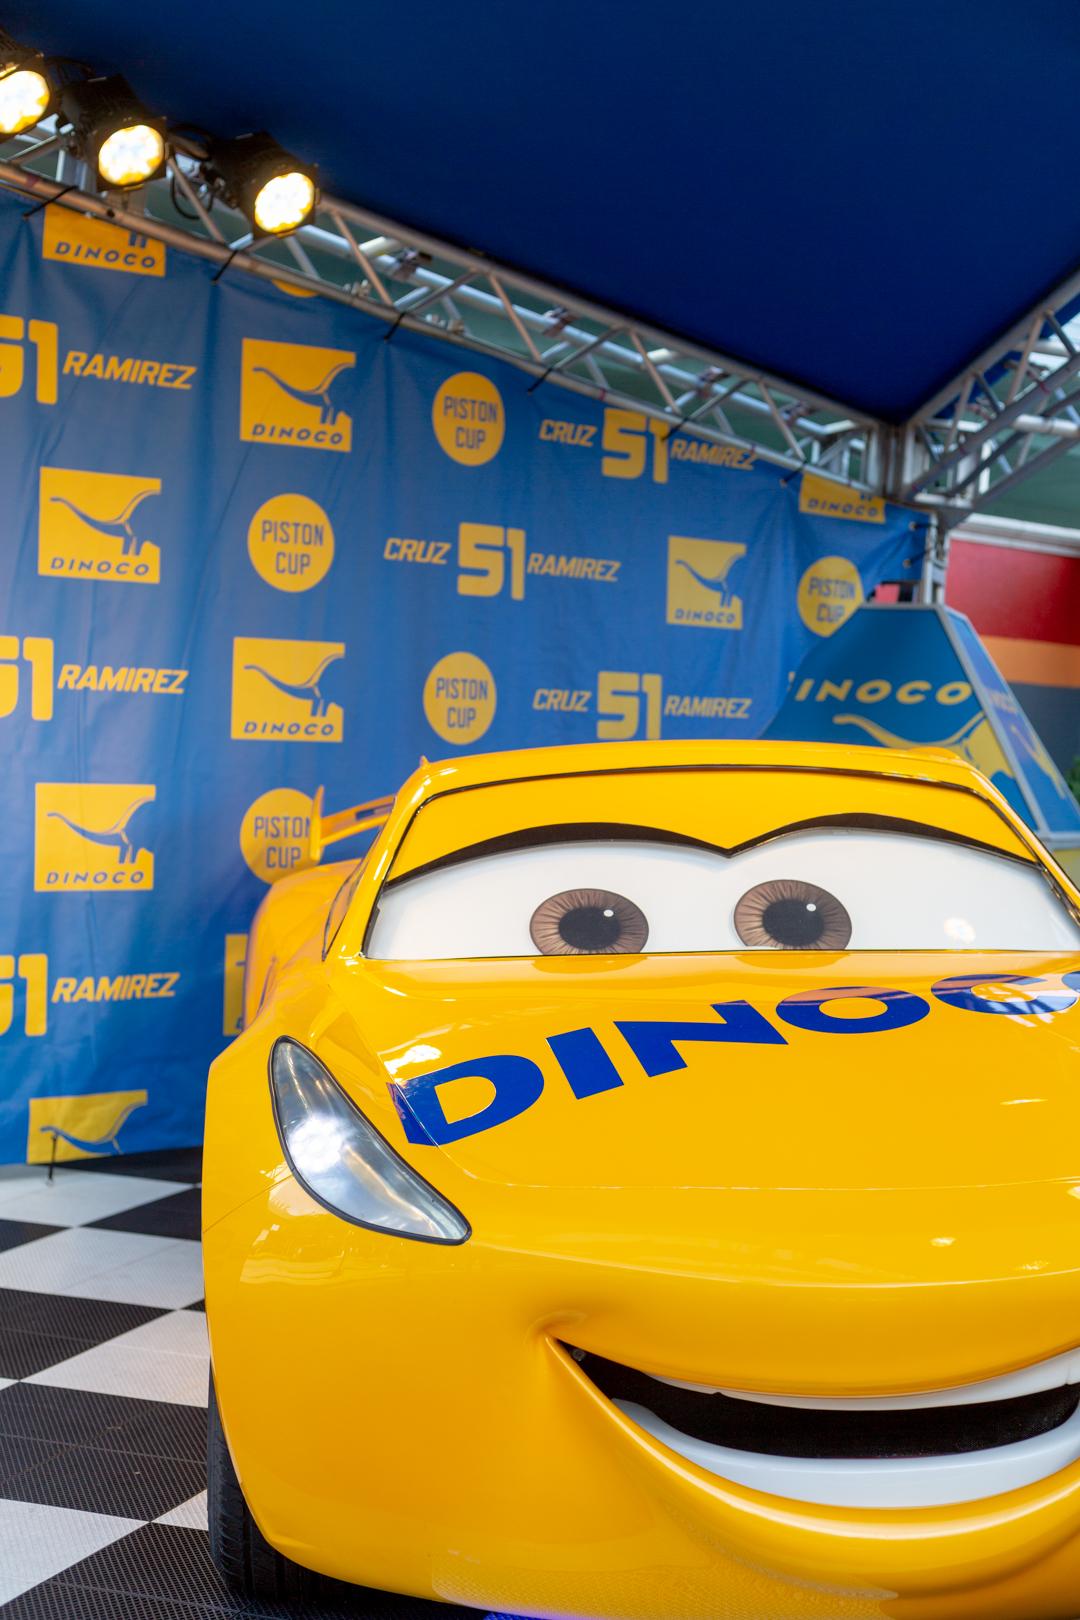 Disney Cars showcase at WDW